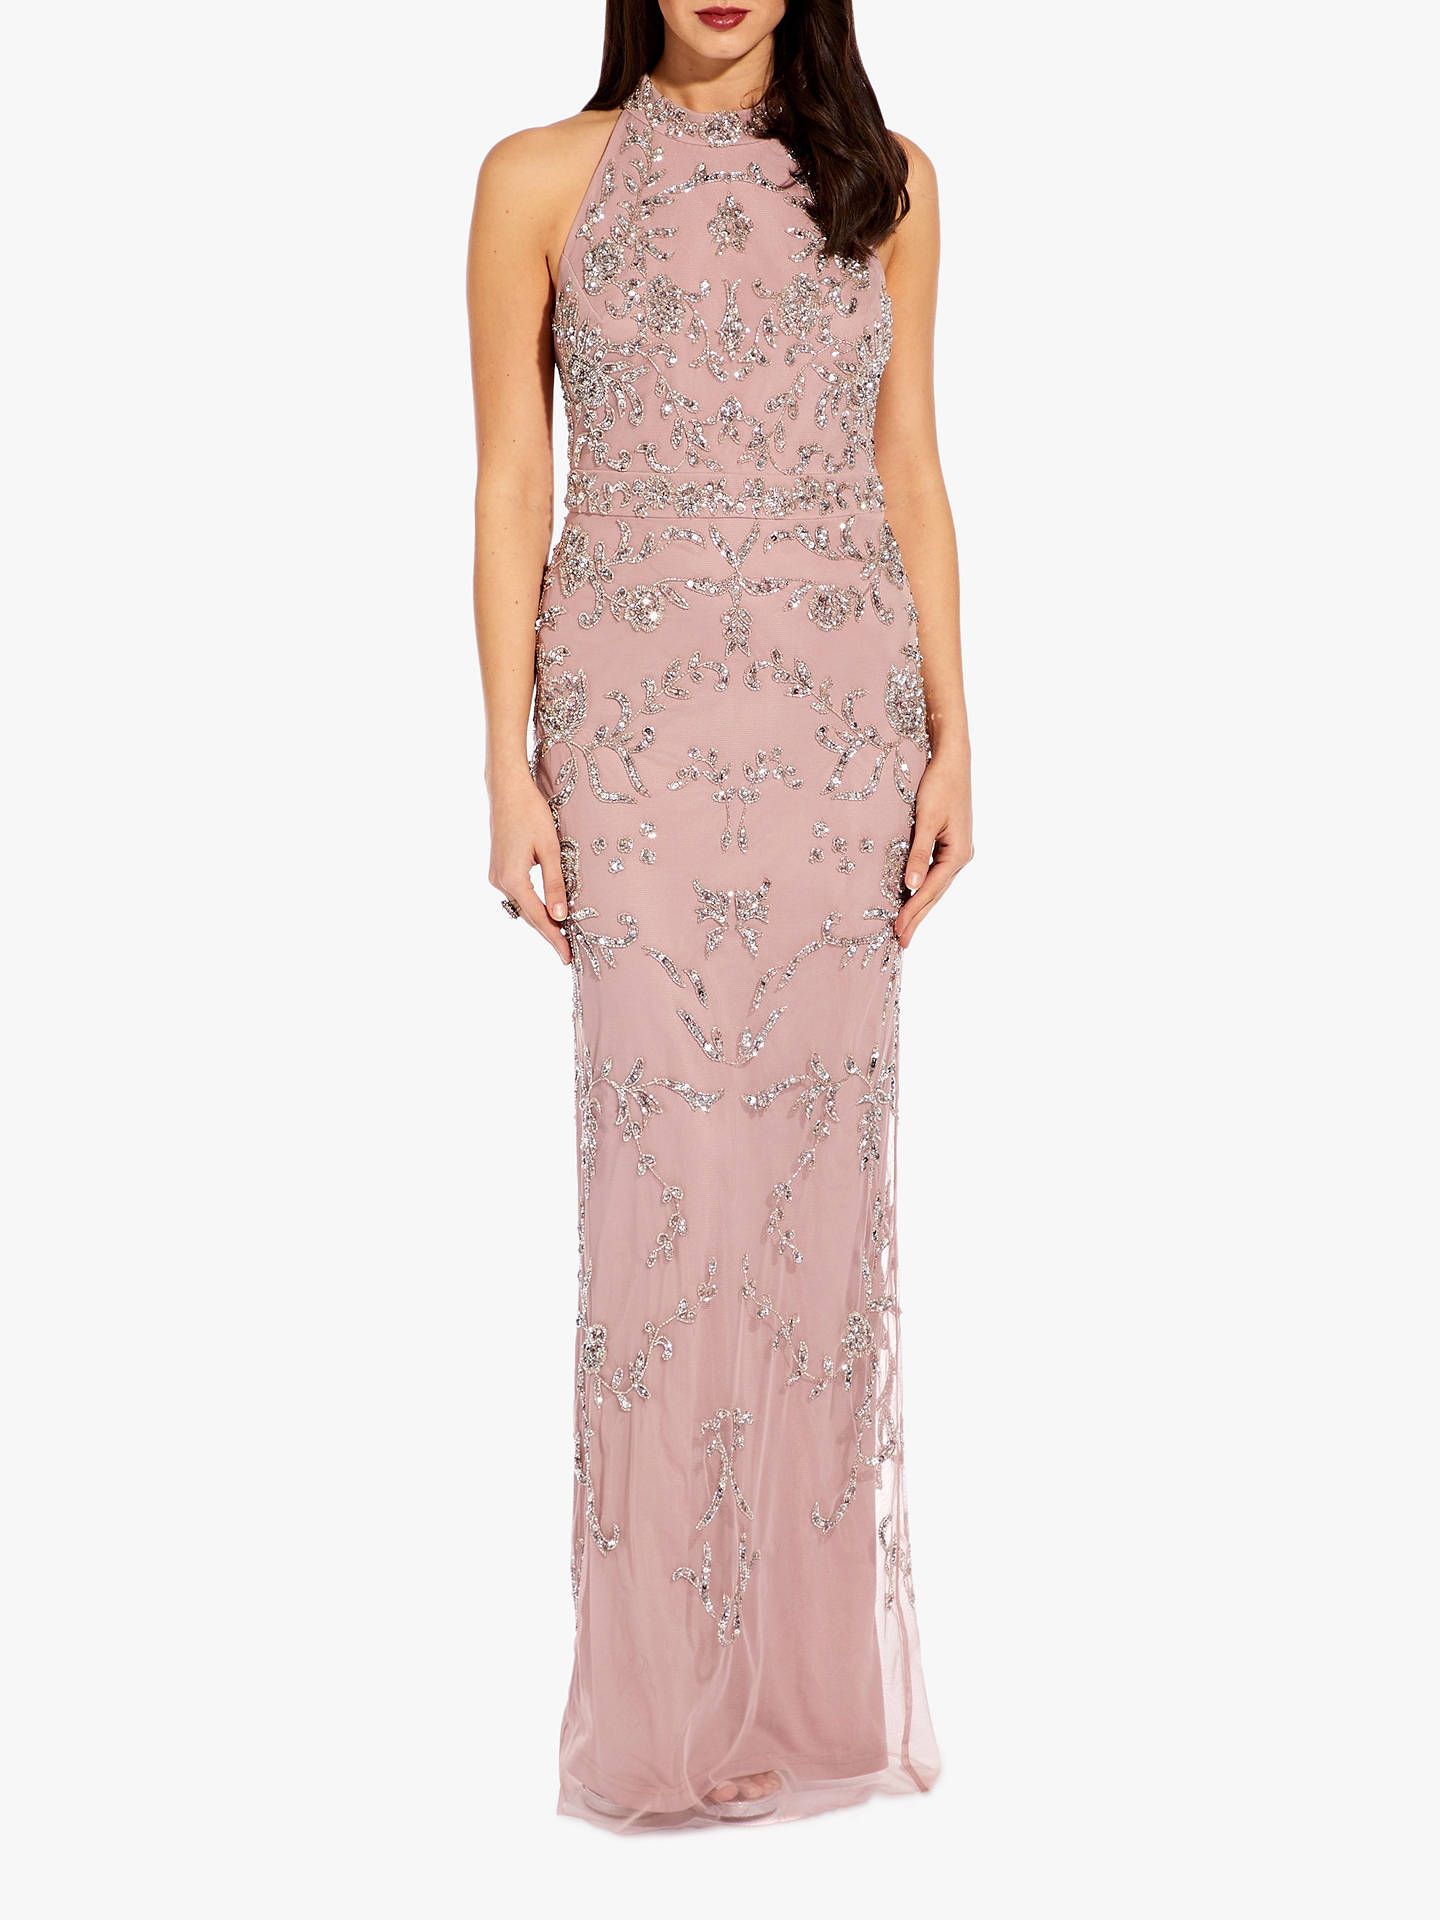 23c0814c3c5 Buy Adrianna Papell Beaded Halter Dress